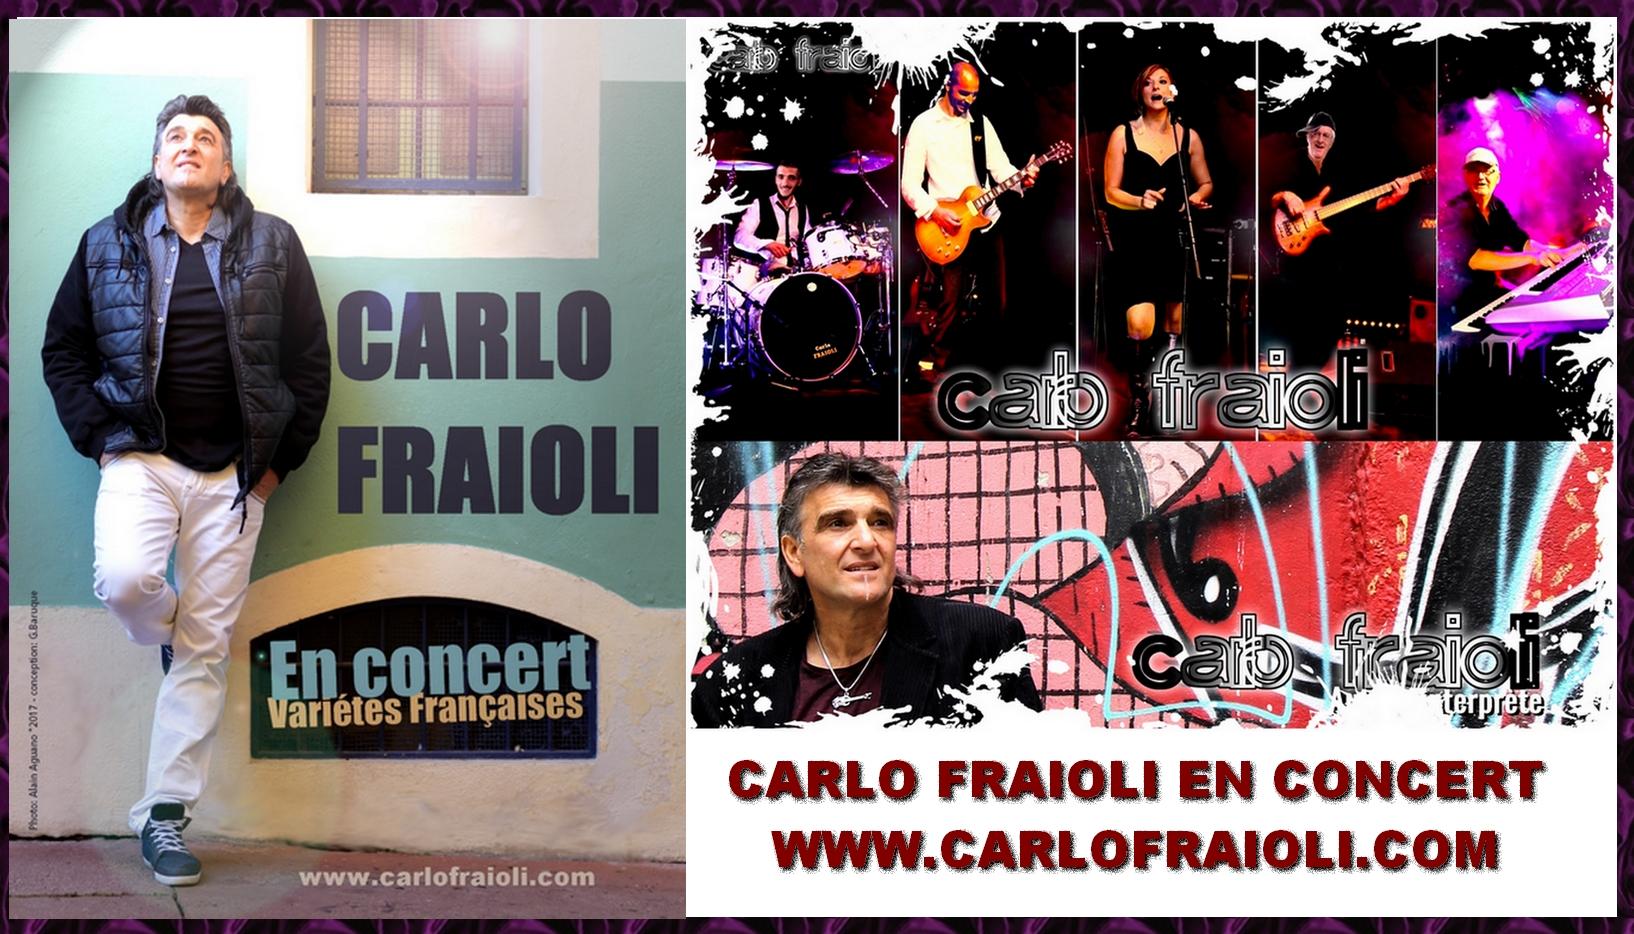 CARLO FRAIOLI EN CONCERT FRANCE